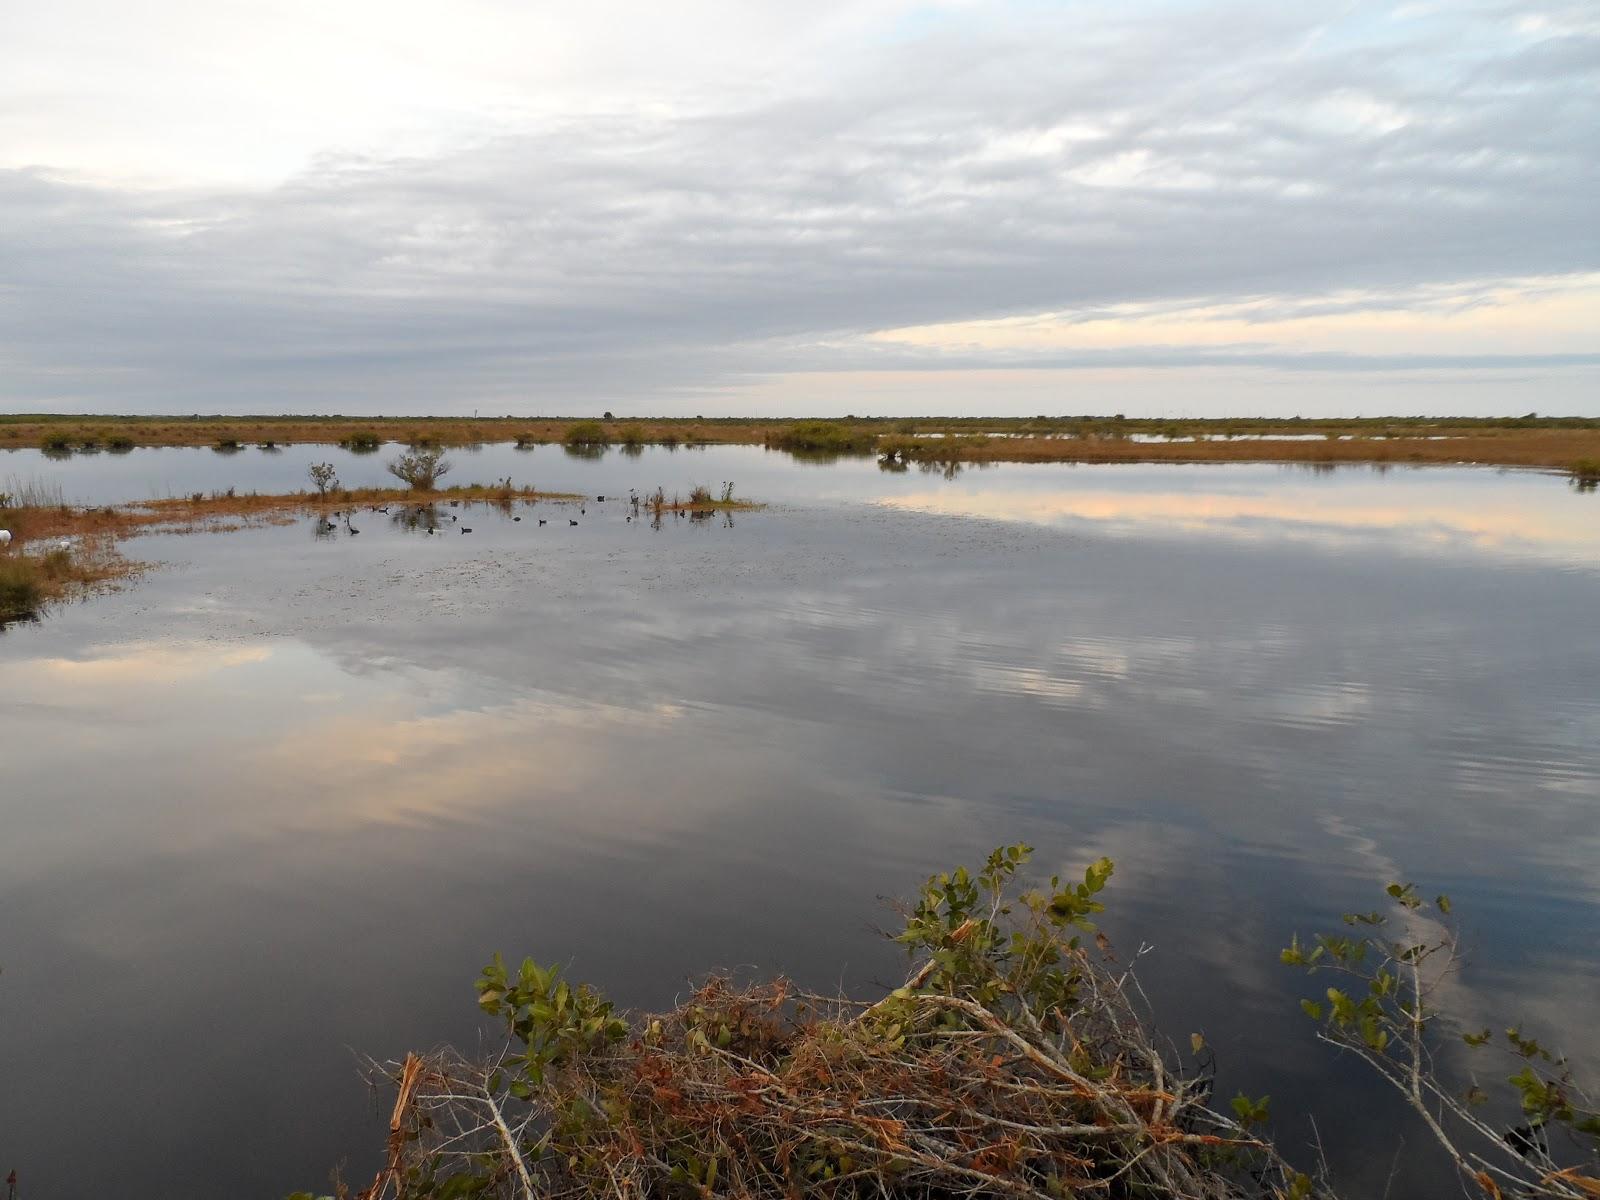 Mosquito lagoon indian river fishing new years eve for Indian river fishing